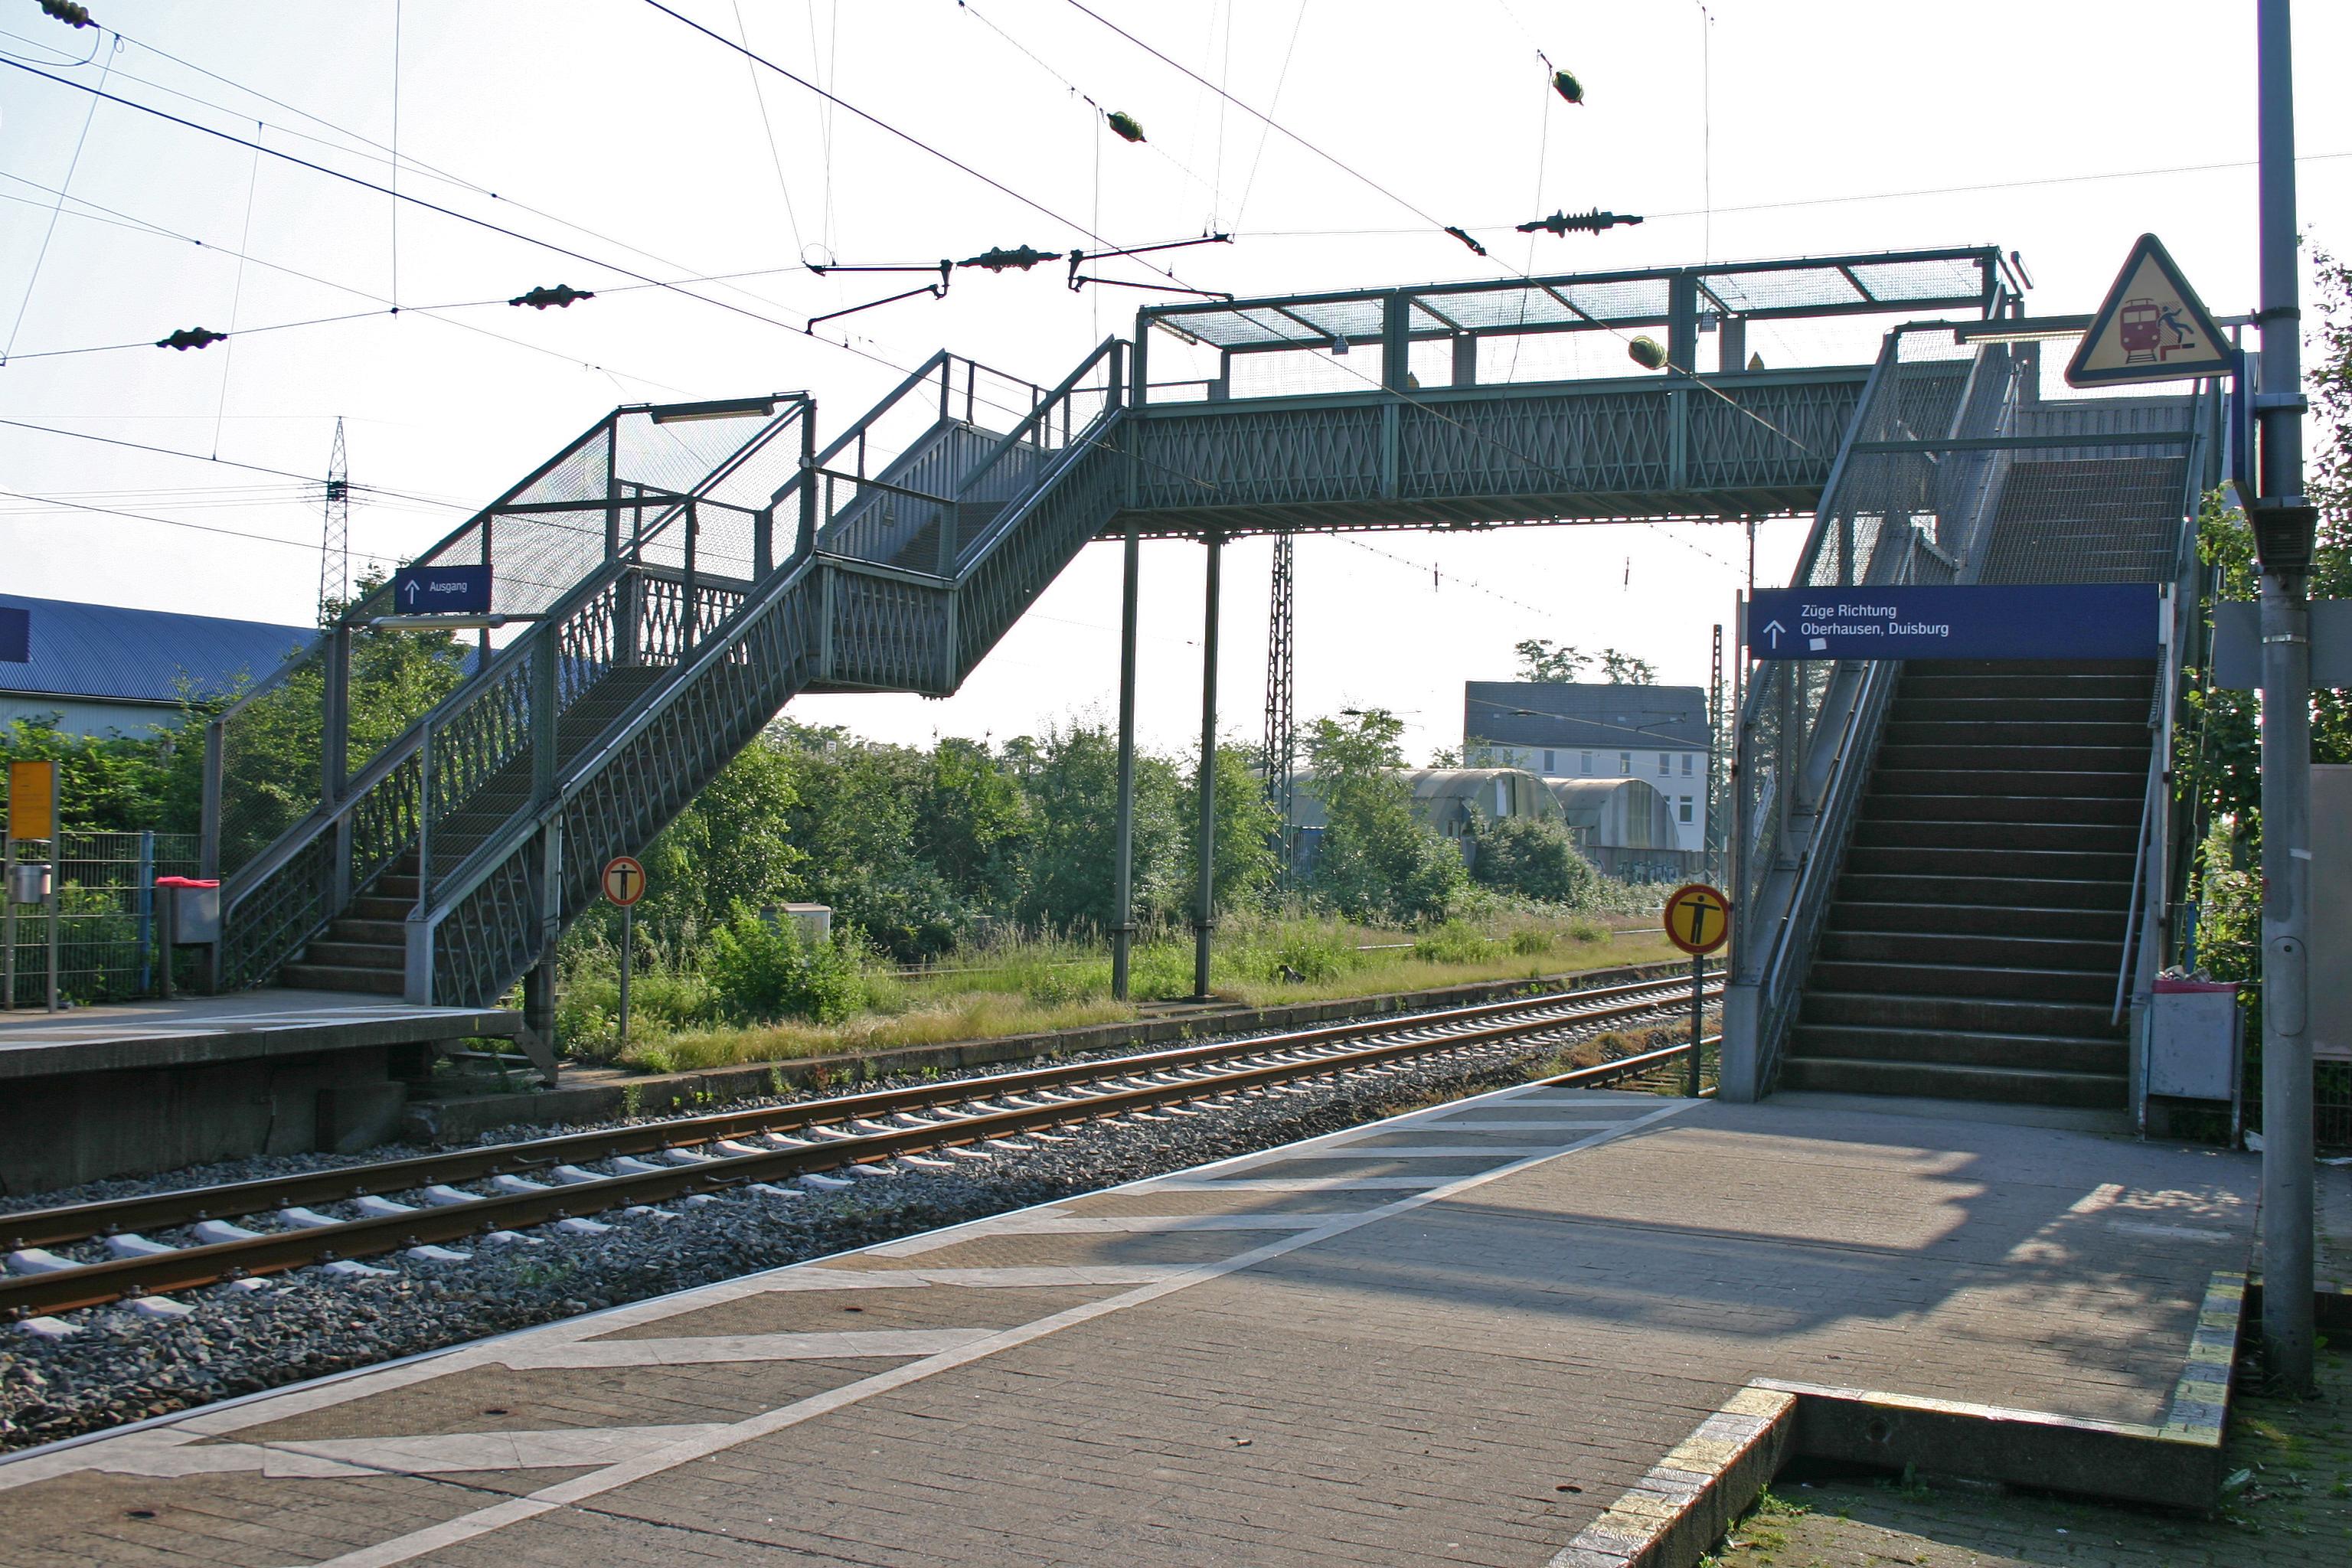 Treppen Essen file haltepunkt essen dellwig 02 treppen jpg wikimedia commons